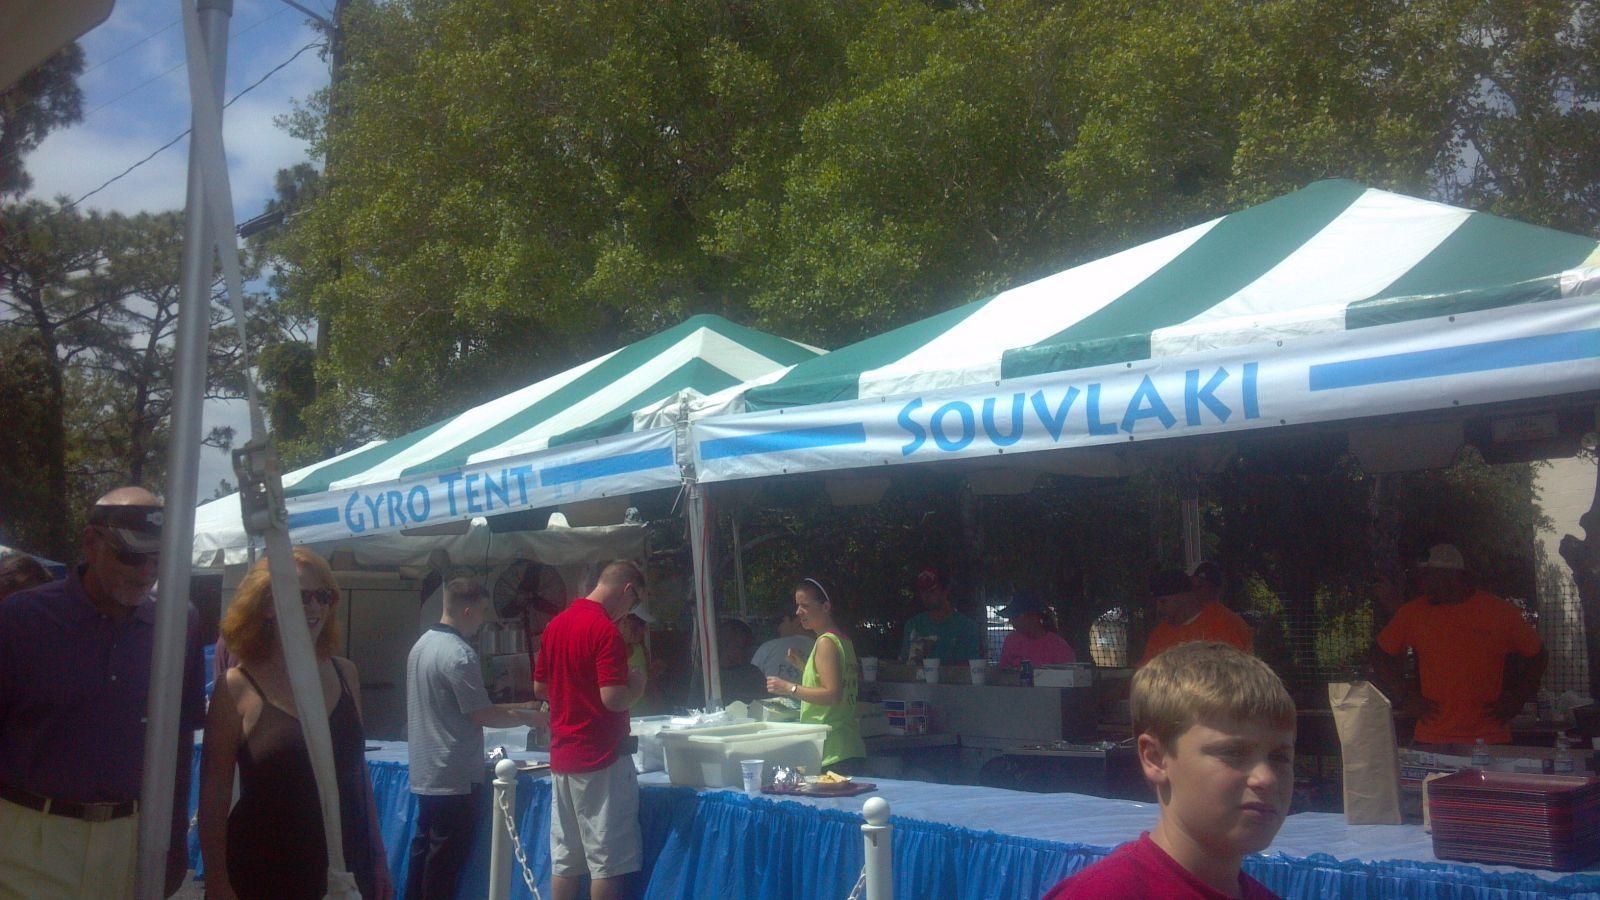 St. Nicholas Greek Orthodox 20th Greek Festival in Wilmington, NC. Gyro and Souvlaki tents....yum!!